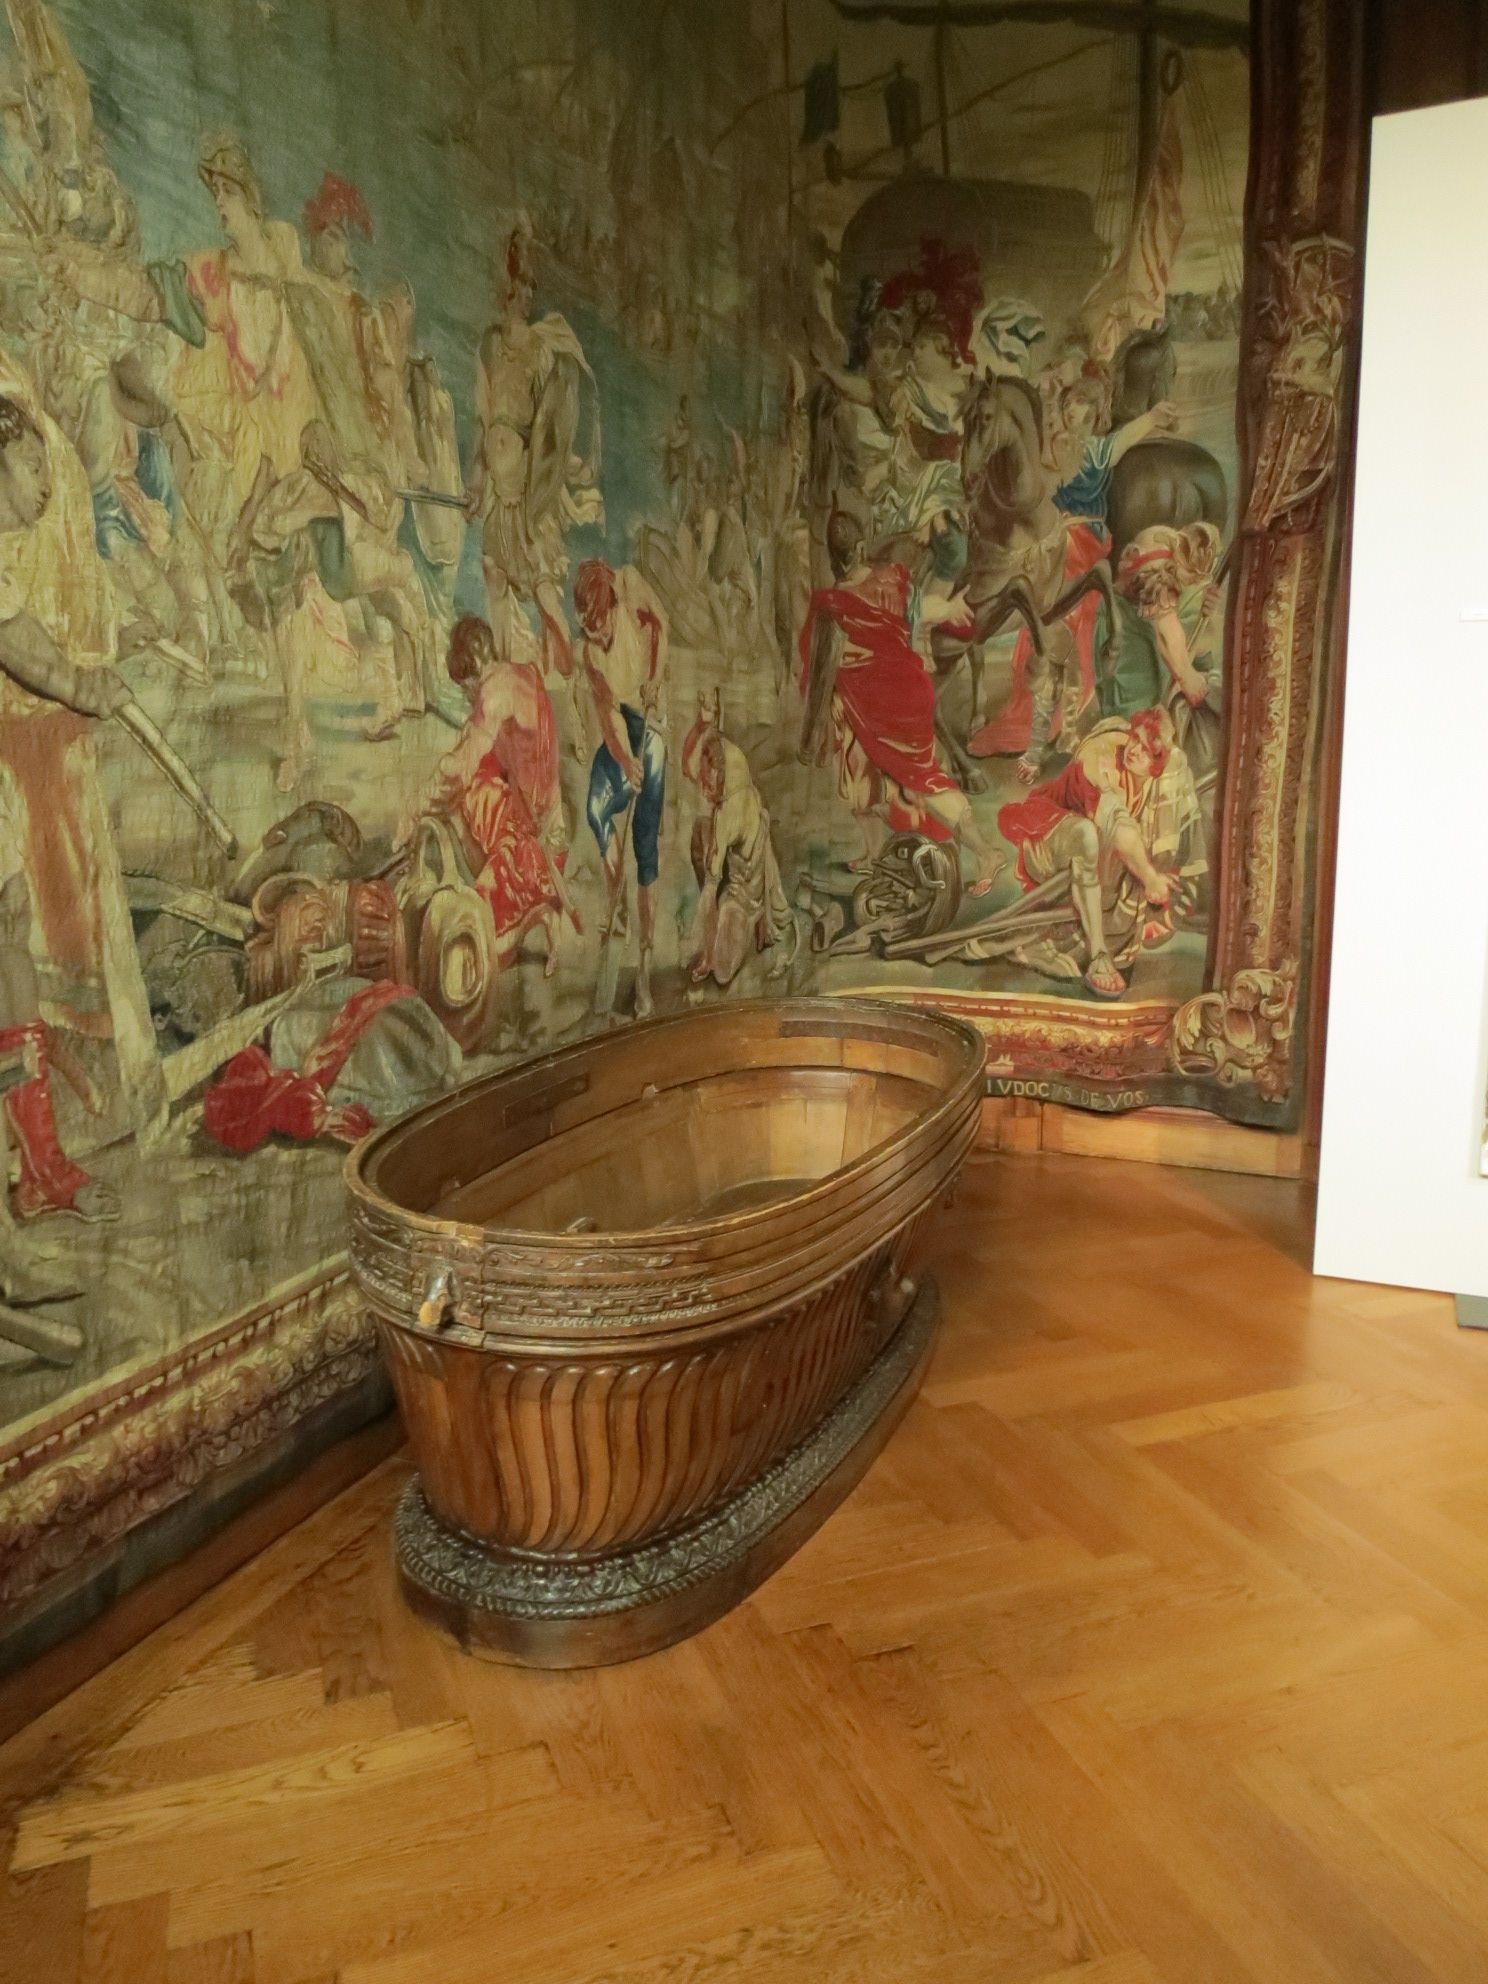 Badezimmer design malta kasteel van gaasbeek  landhaus badezimmer ideen  pinterest  spaces